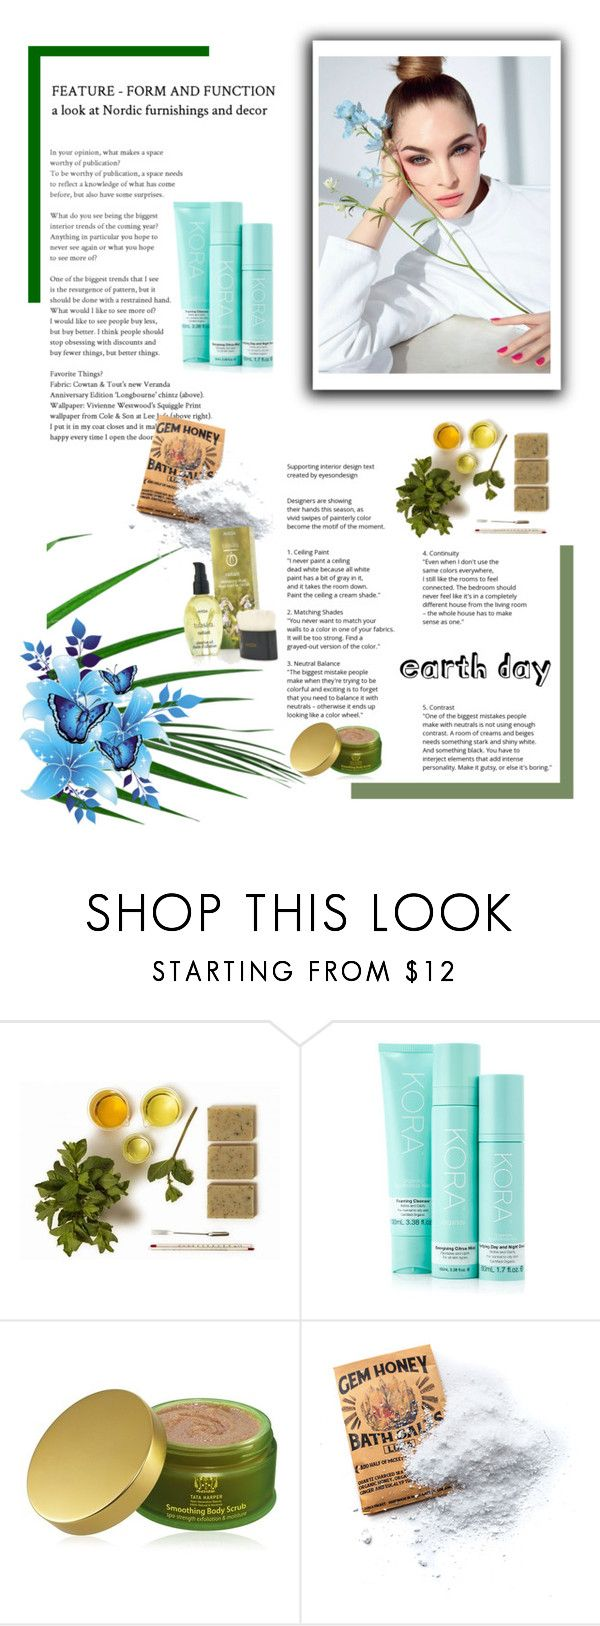 """Earth Day Essentials: All-Natural Beauty"" by malinda108 ❤ liked on Polyvore featuring beauty, KORA Organics by Miranda Kerr, Tata Harper, Wild Honey Apothecary, Aveda and earthday"